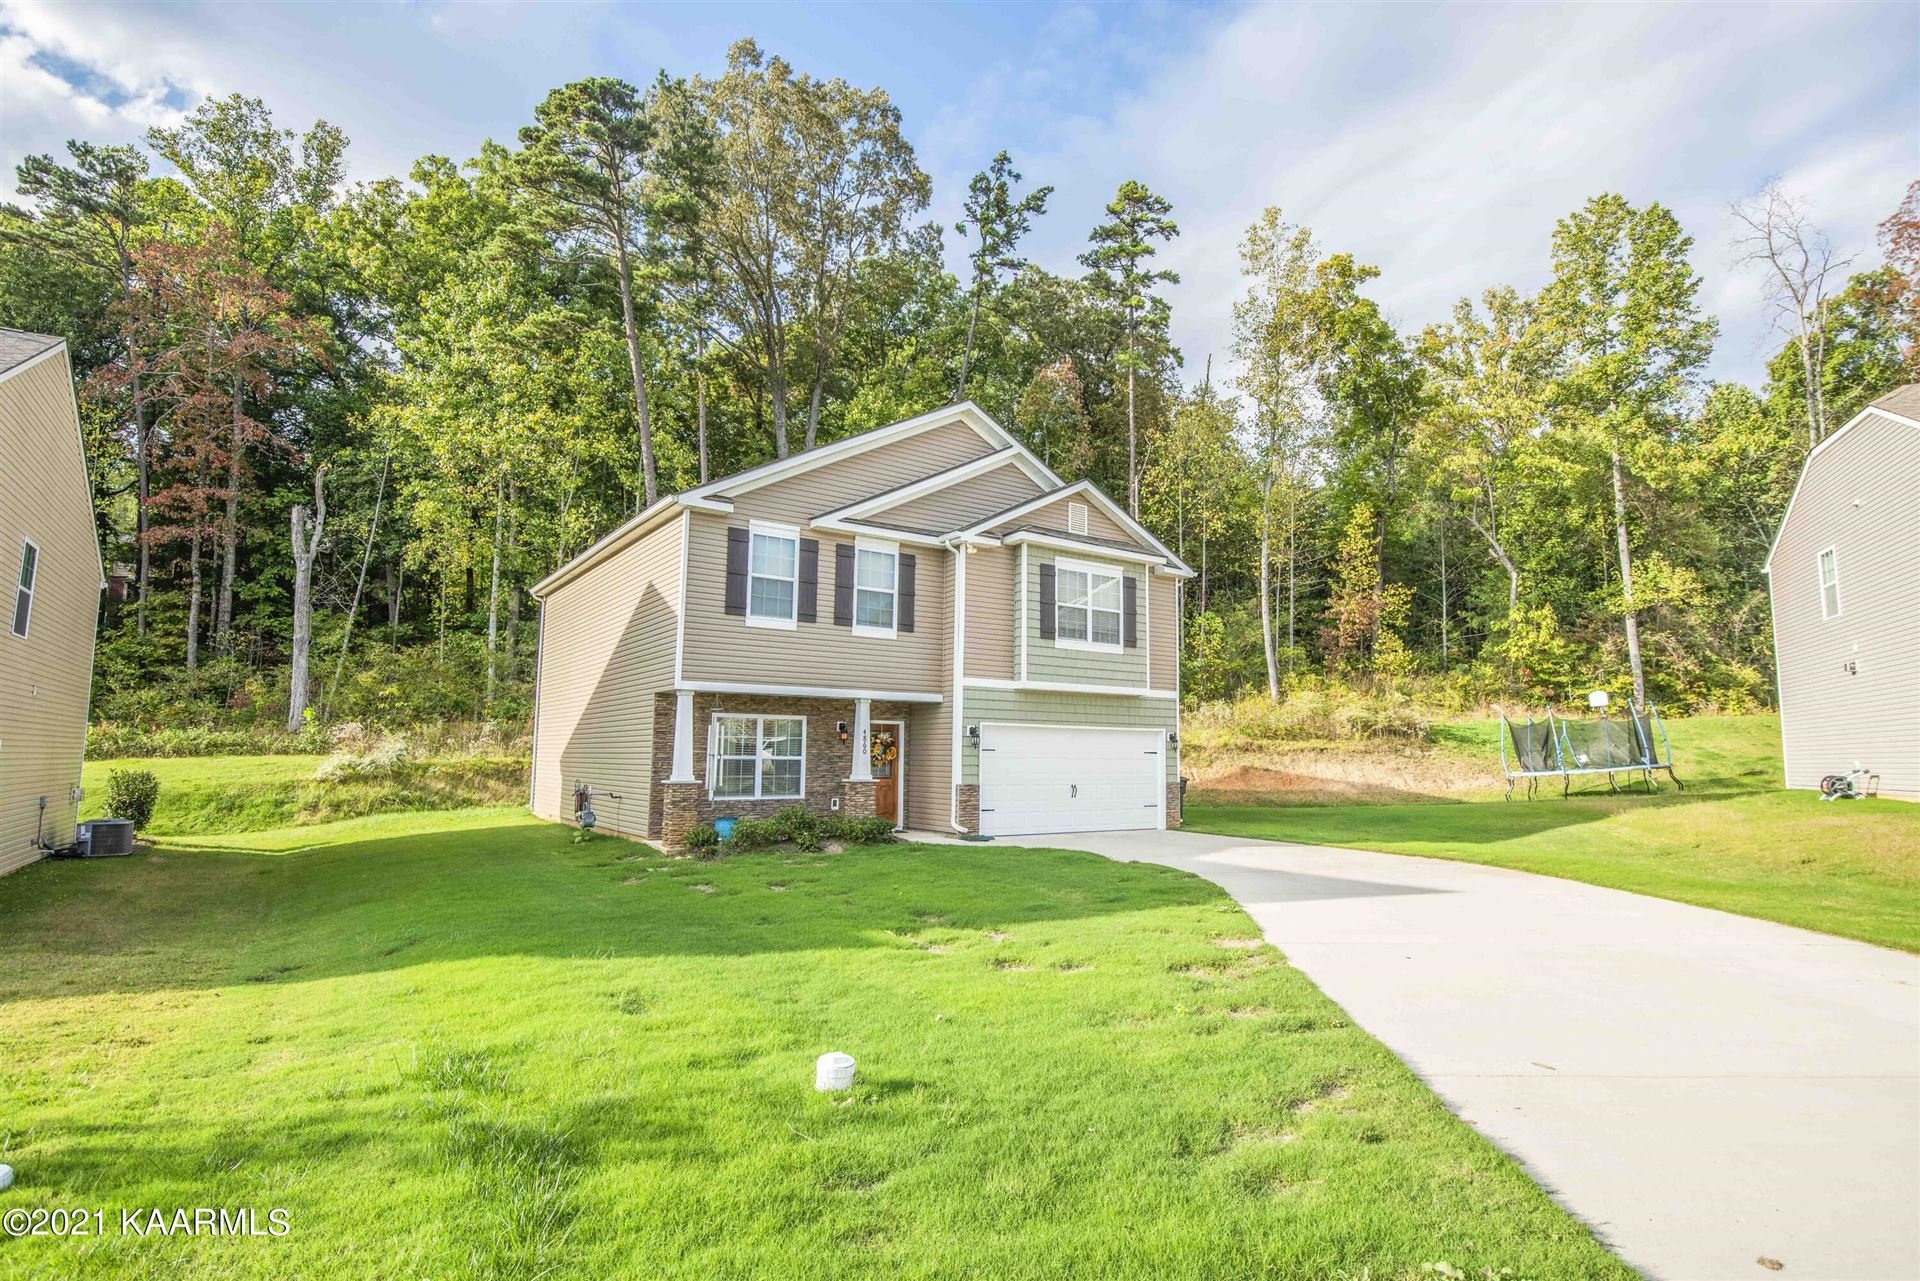 Photo of 4860 Billingsgate Lane, Knoxville, TN 37918 (MLS # 1170834)